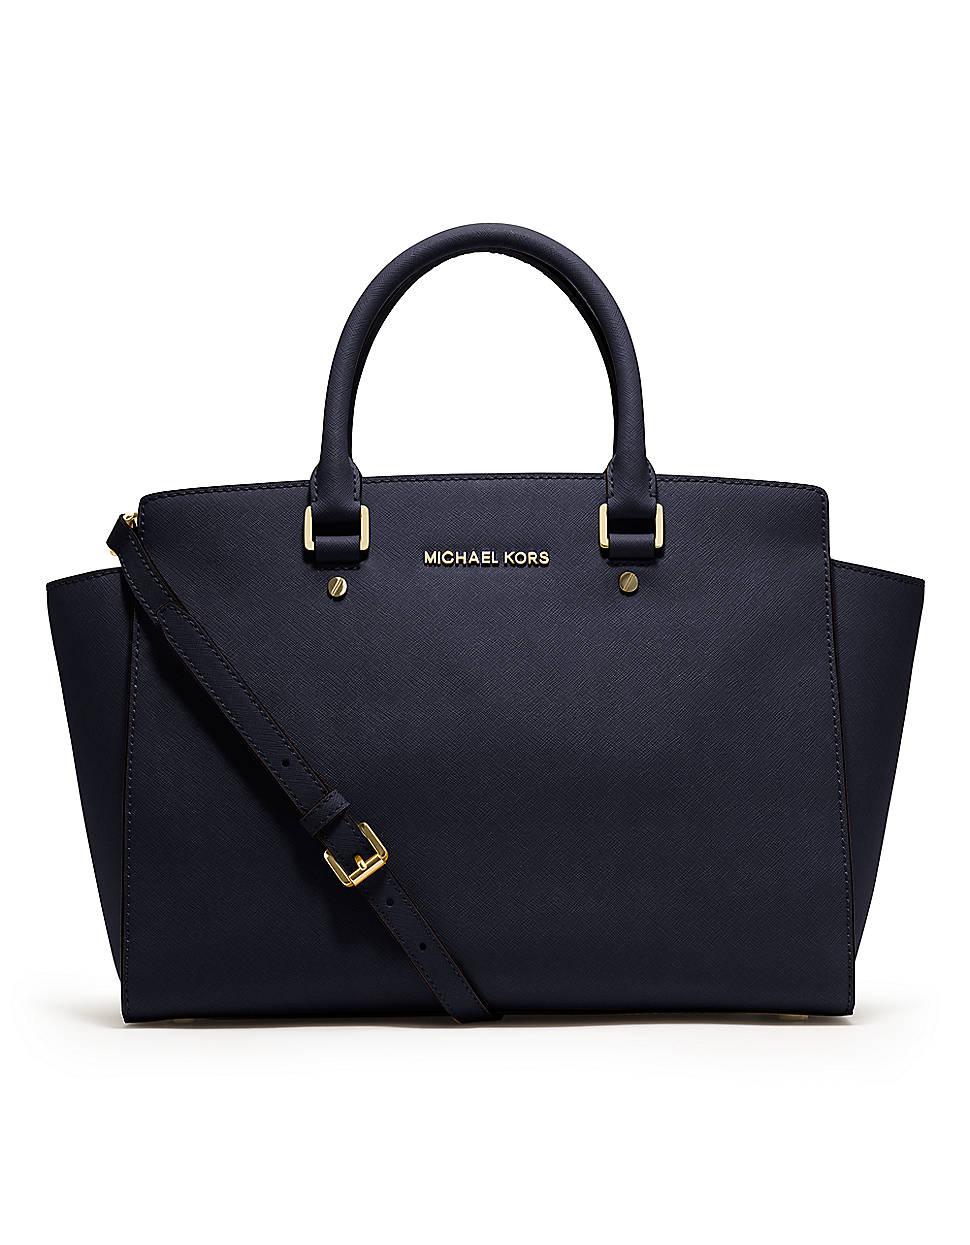 michael michael kors selma saffiano leather large satchel. Black Bedroom Furniture Sets. Home Design Ideas